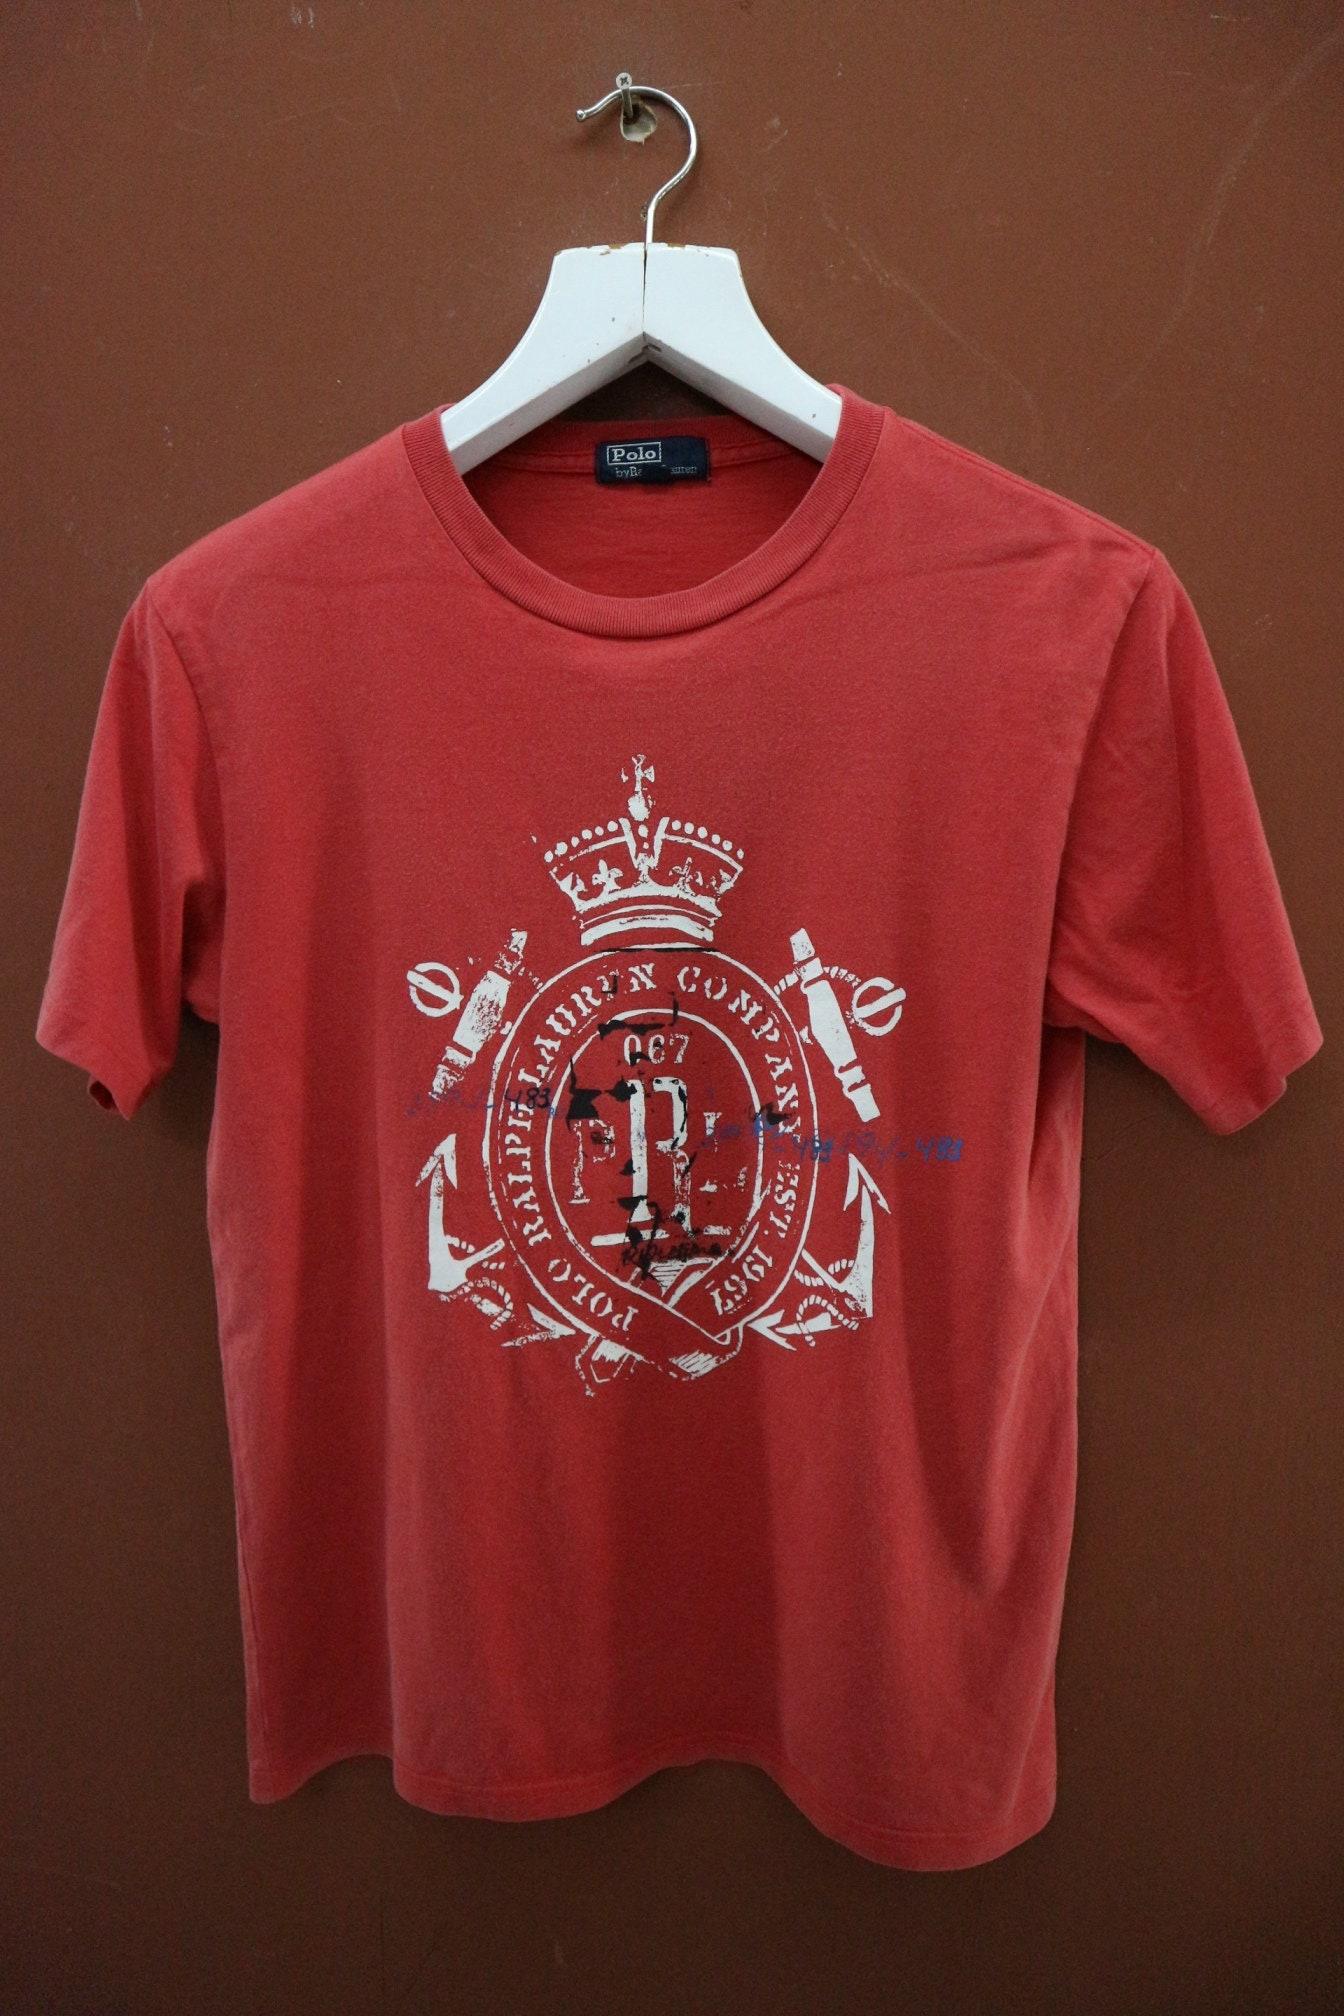 Polo Ralph Lauren Vintage Couronne T-Shirt Designer Casual Street porter  haut tee-shirt taille 160 d5599e267a42